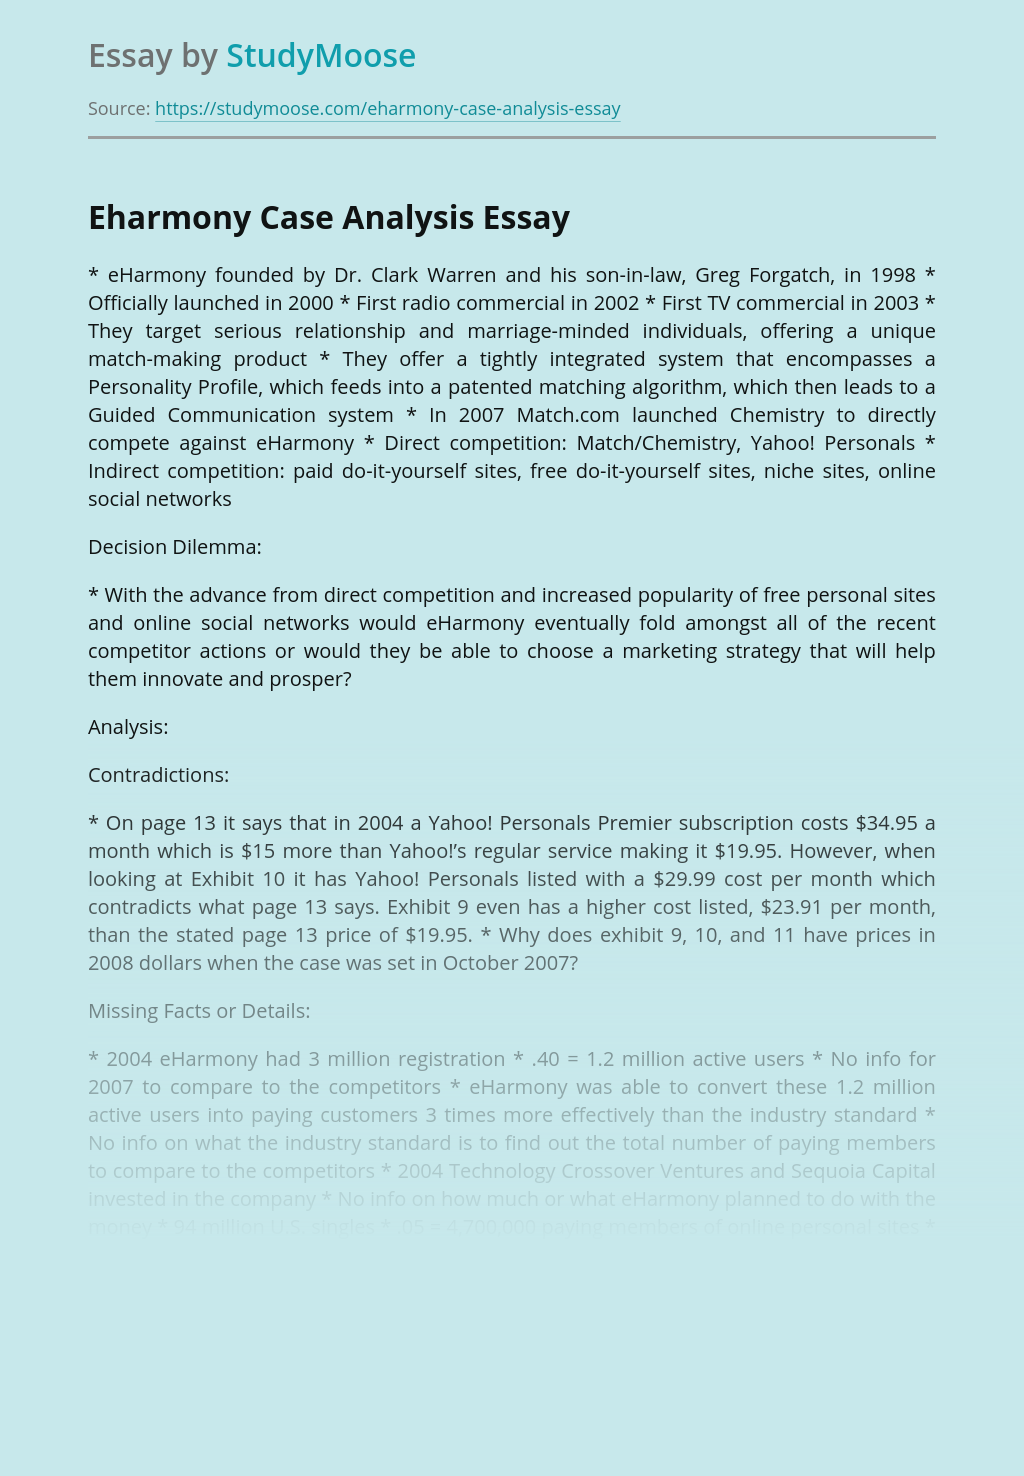 Marketing And Advertising of eHarmony Analysis